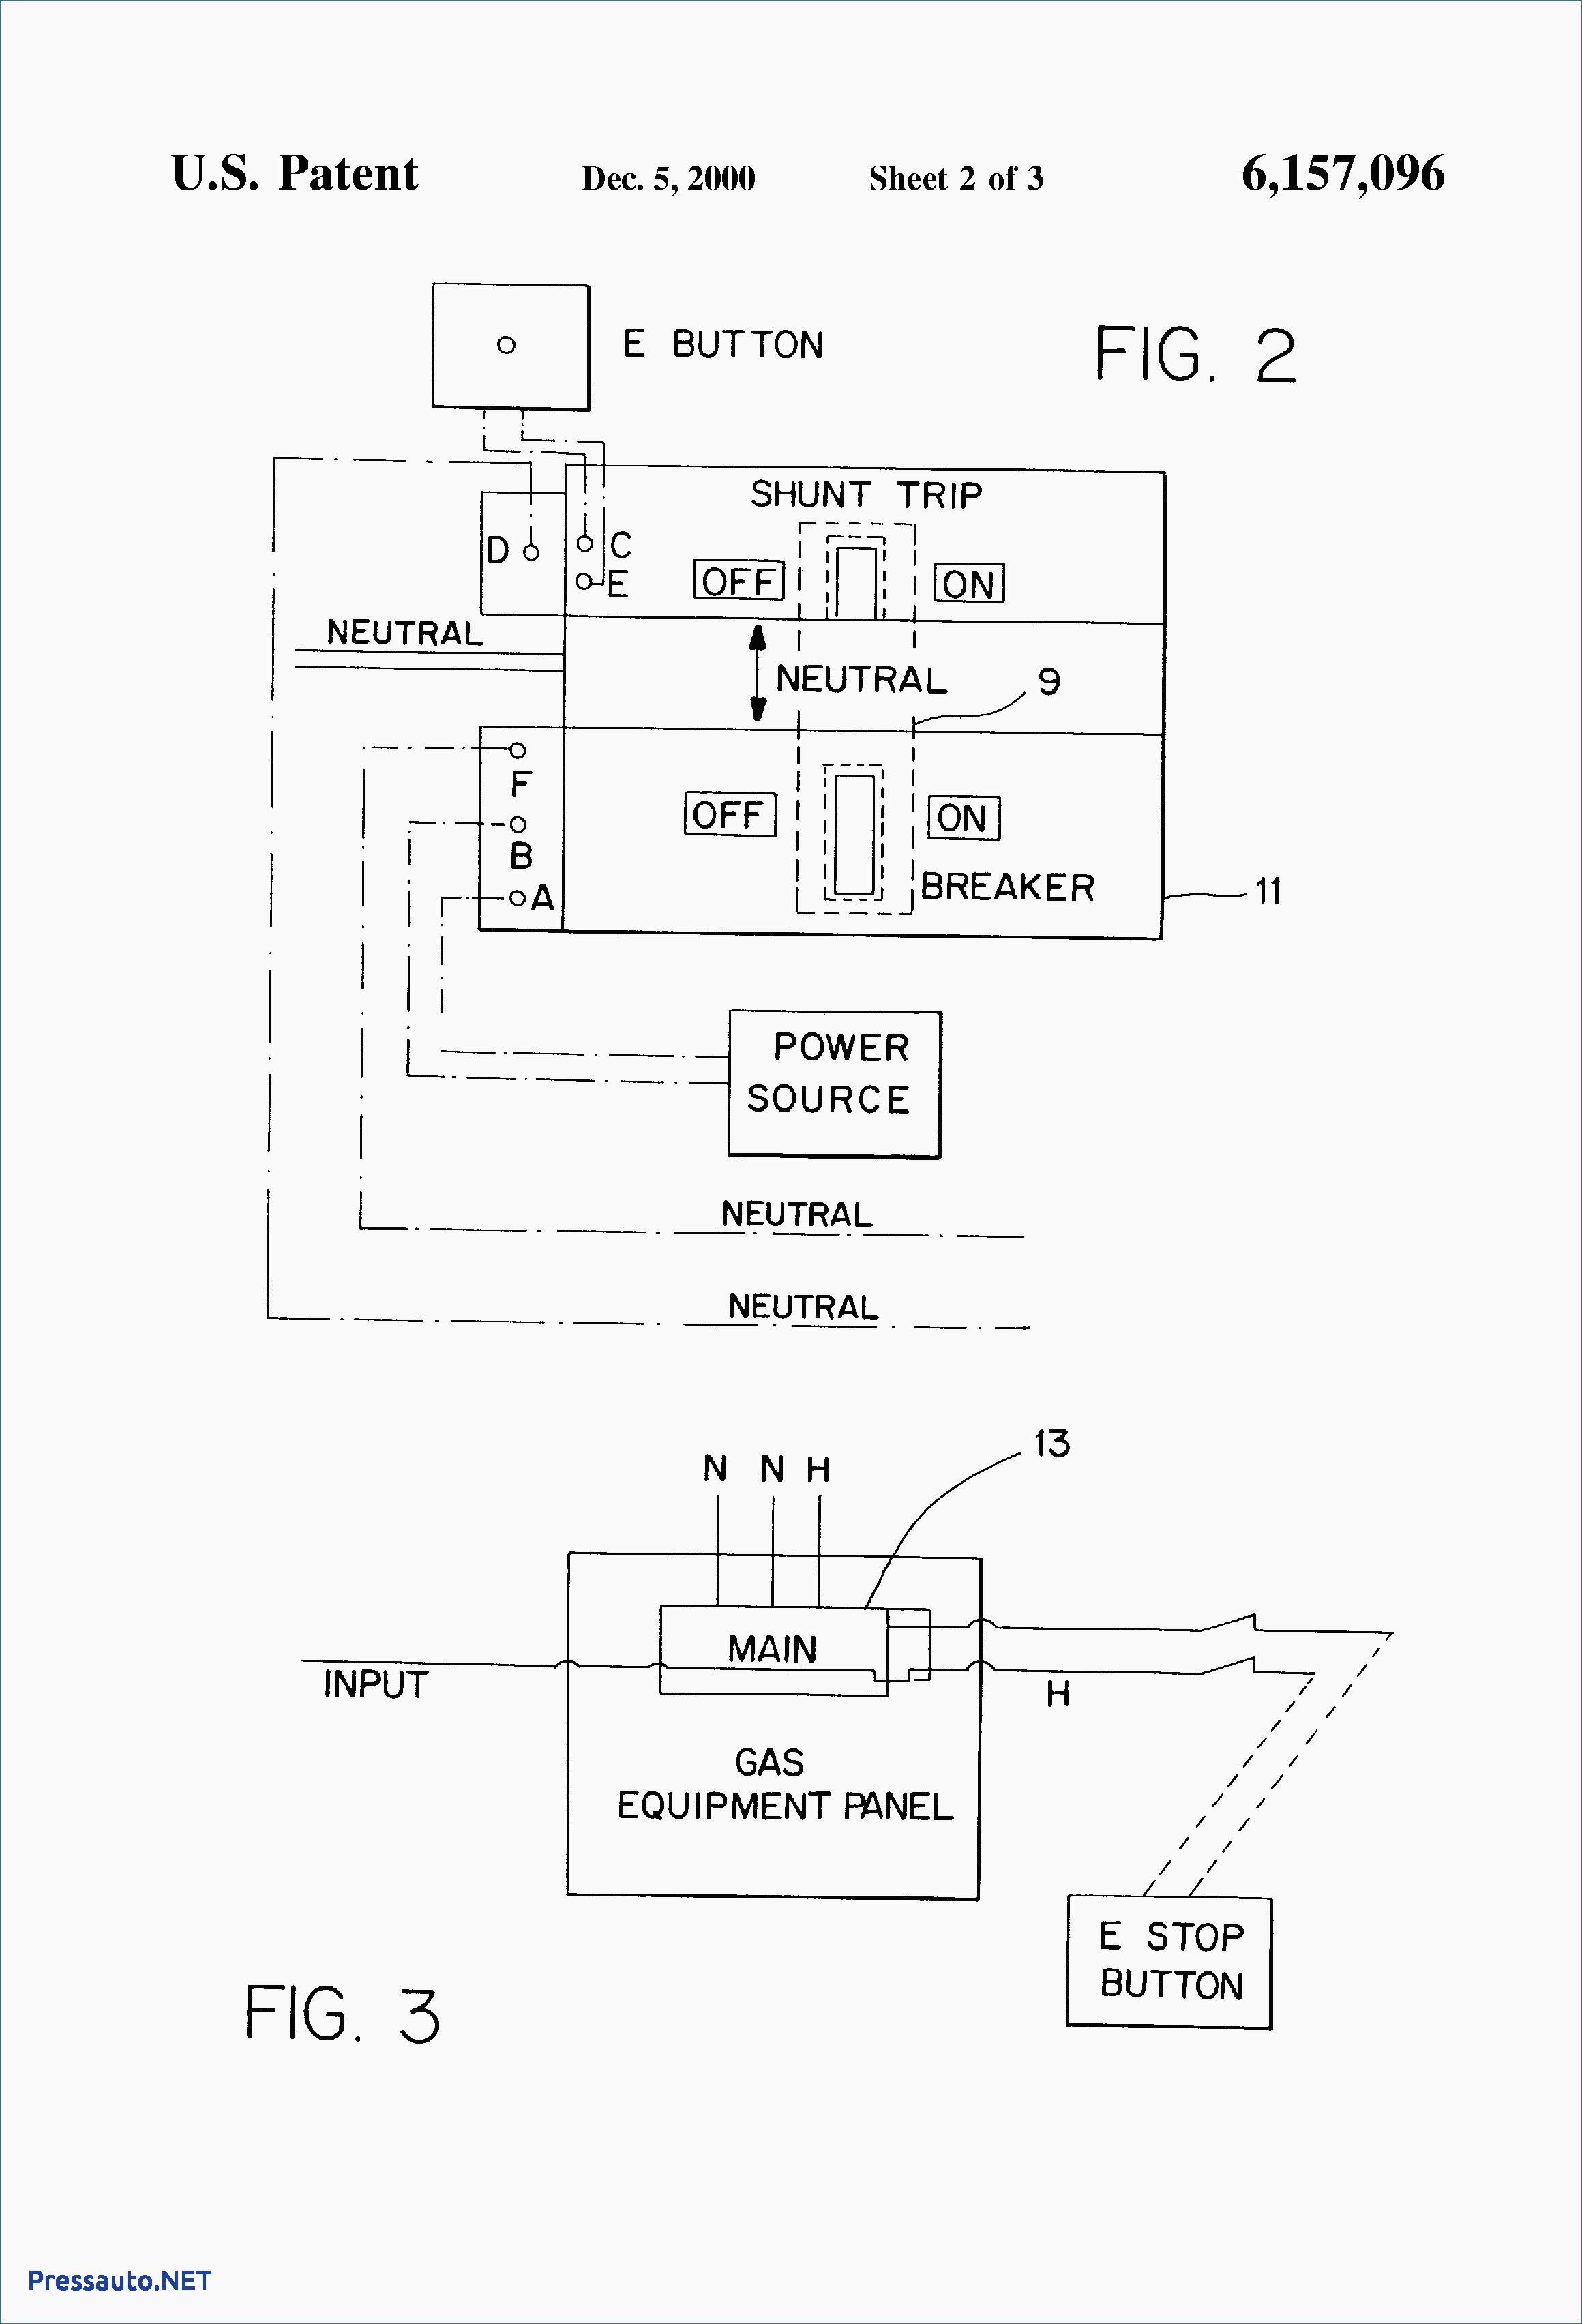 Square D Shunt Trip Breaker Wiring Diagram Circuit Breaker Shunt Trip Wiring Diagram Fresh Square Siemens the D Of Square D Shunt Trip Breaker Wiring Diagram